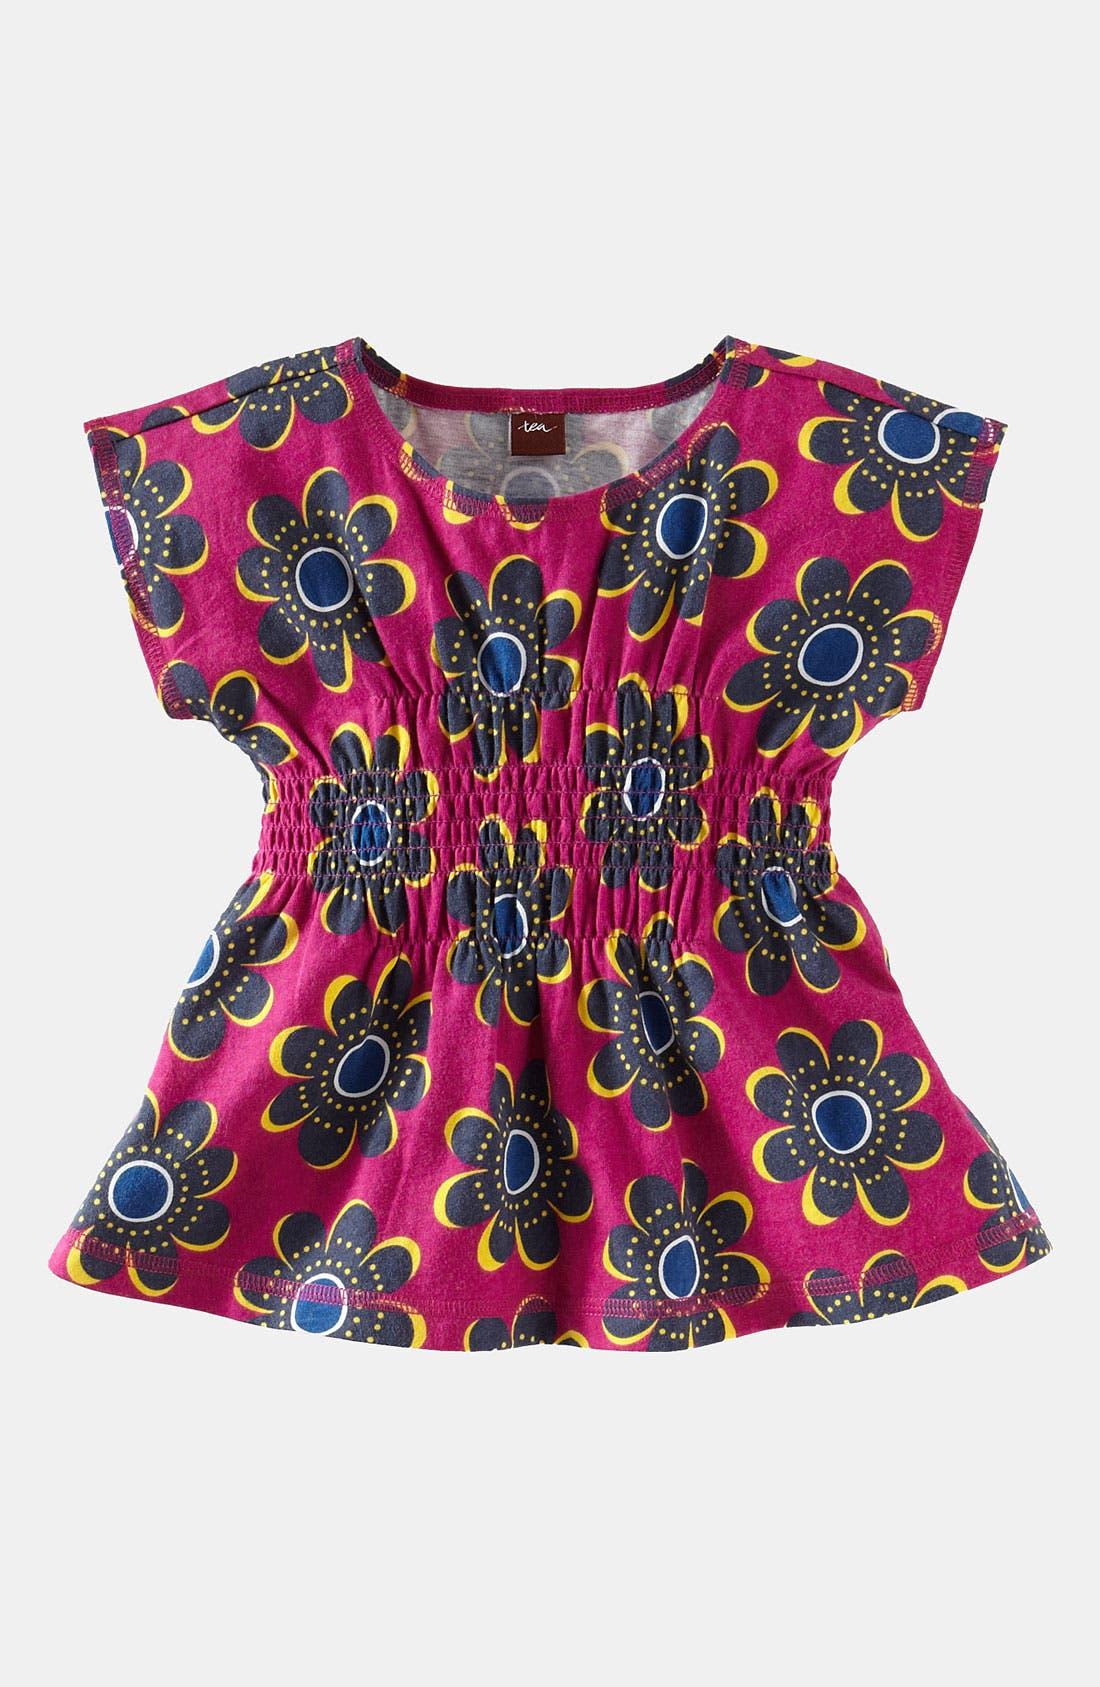 Alternate Image 1 Selected - Tea Collection 'Rosebank' Smocked Top (Toddler)